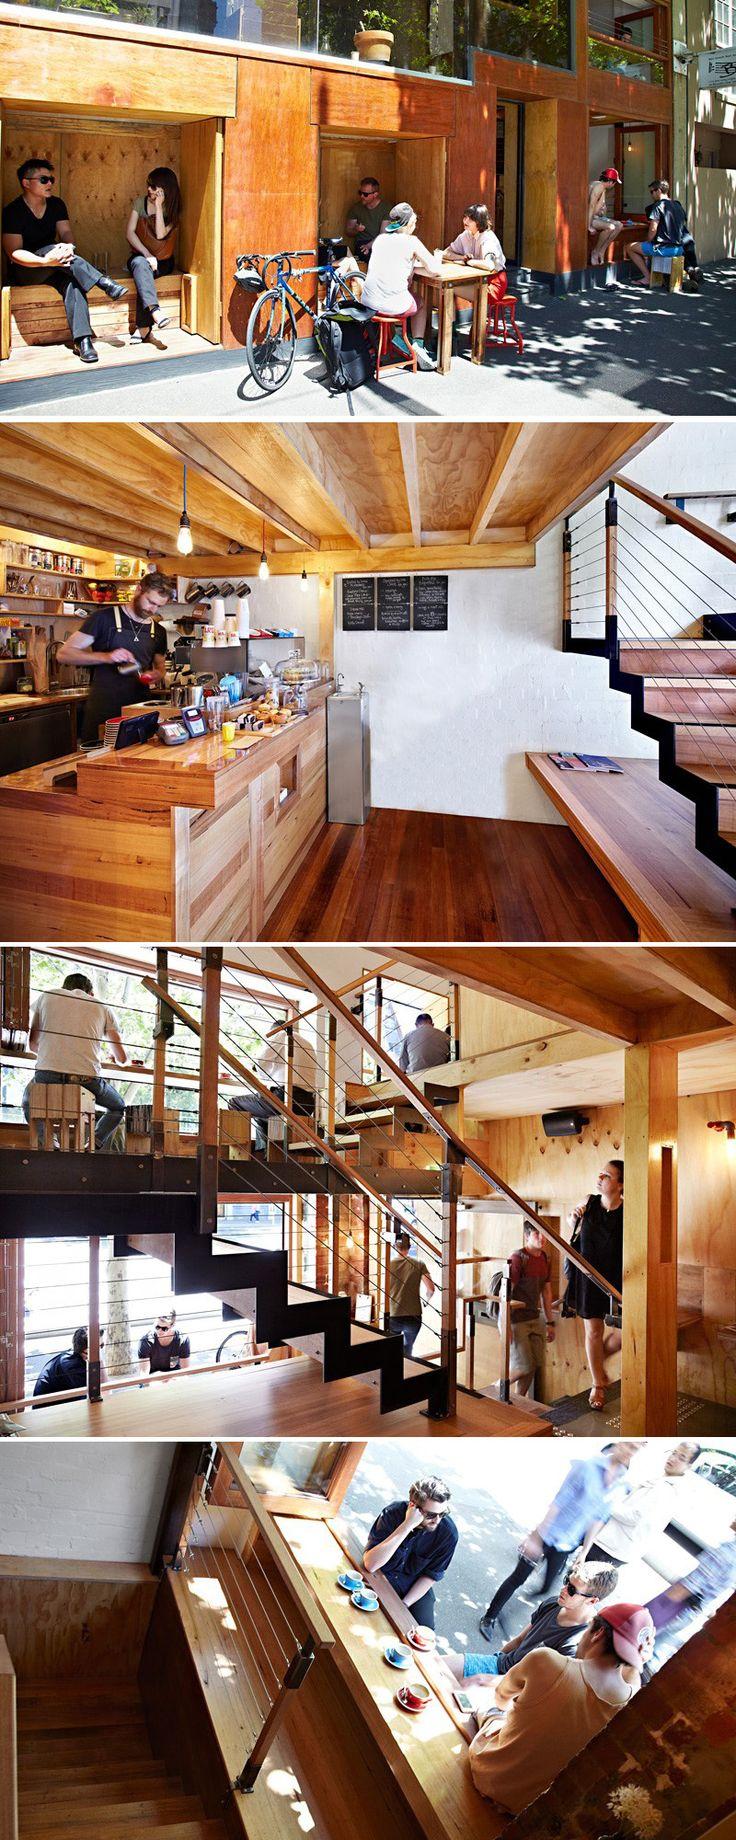 Flipboard, a tiny multi-level cafe in Melbourne, Australia.